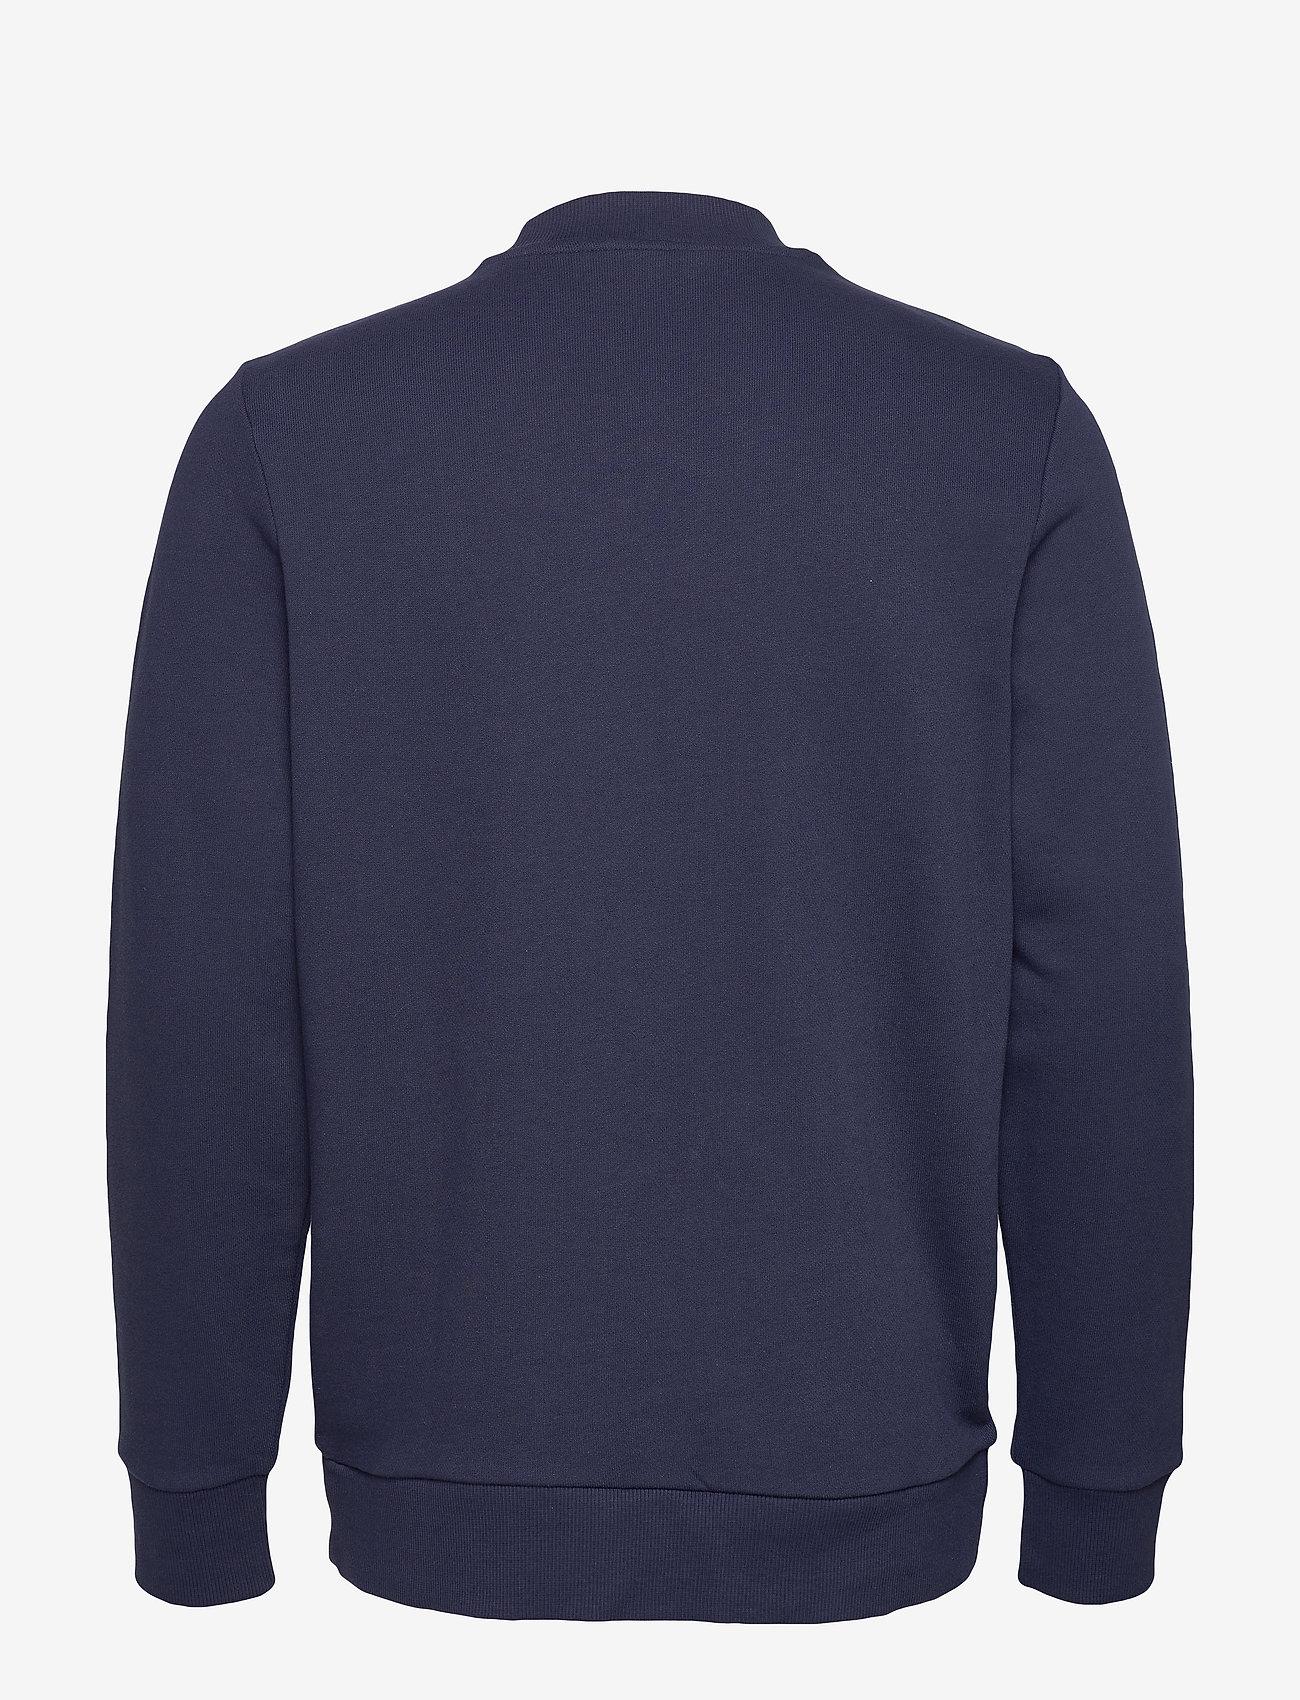 Reebok Classics CL F VECTOR CREW - Sweatshirts VECNAV - Menn Klær